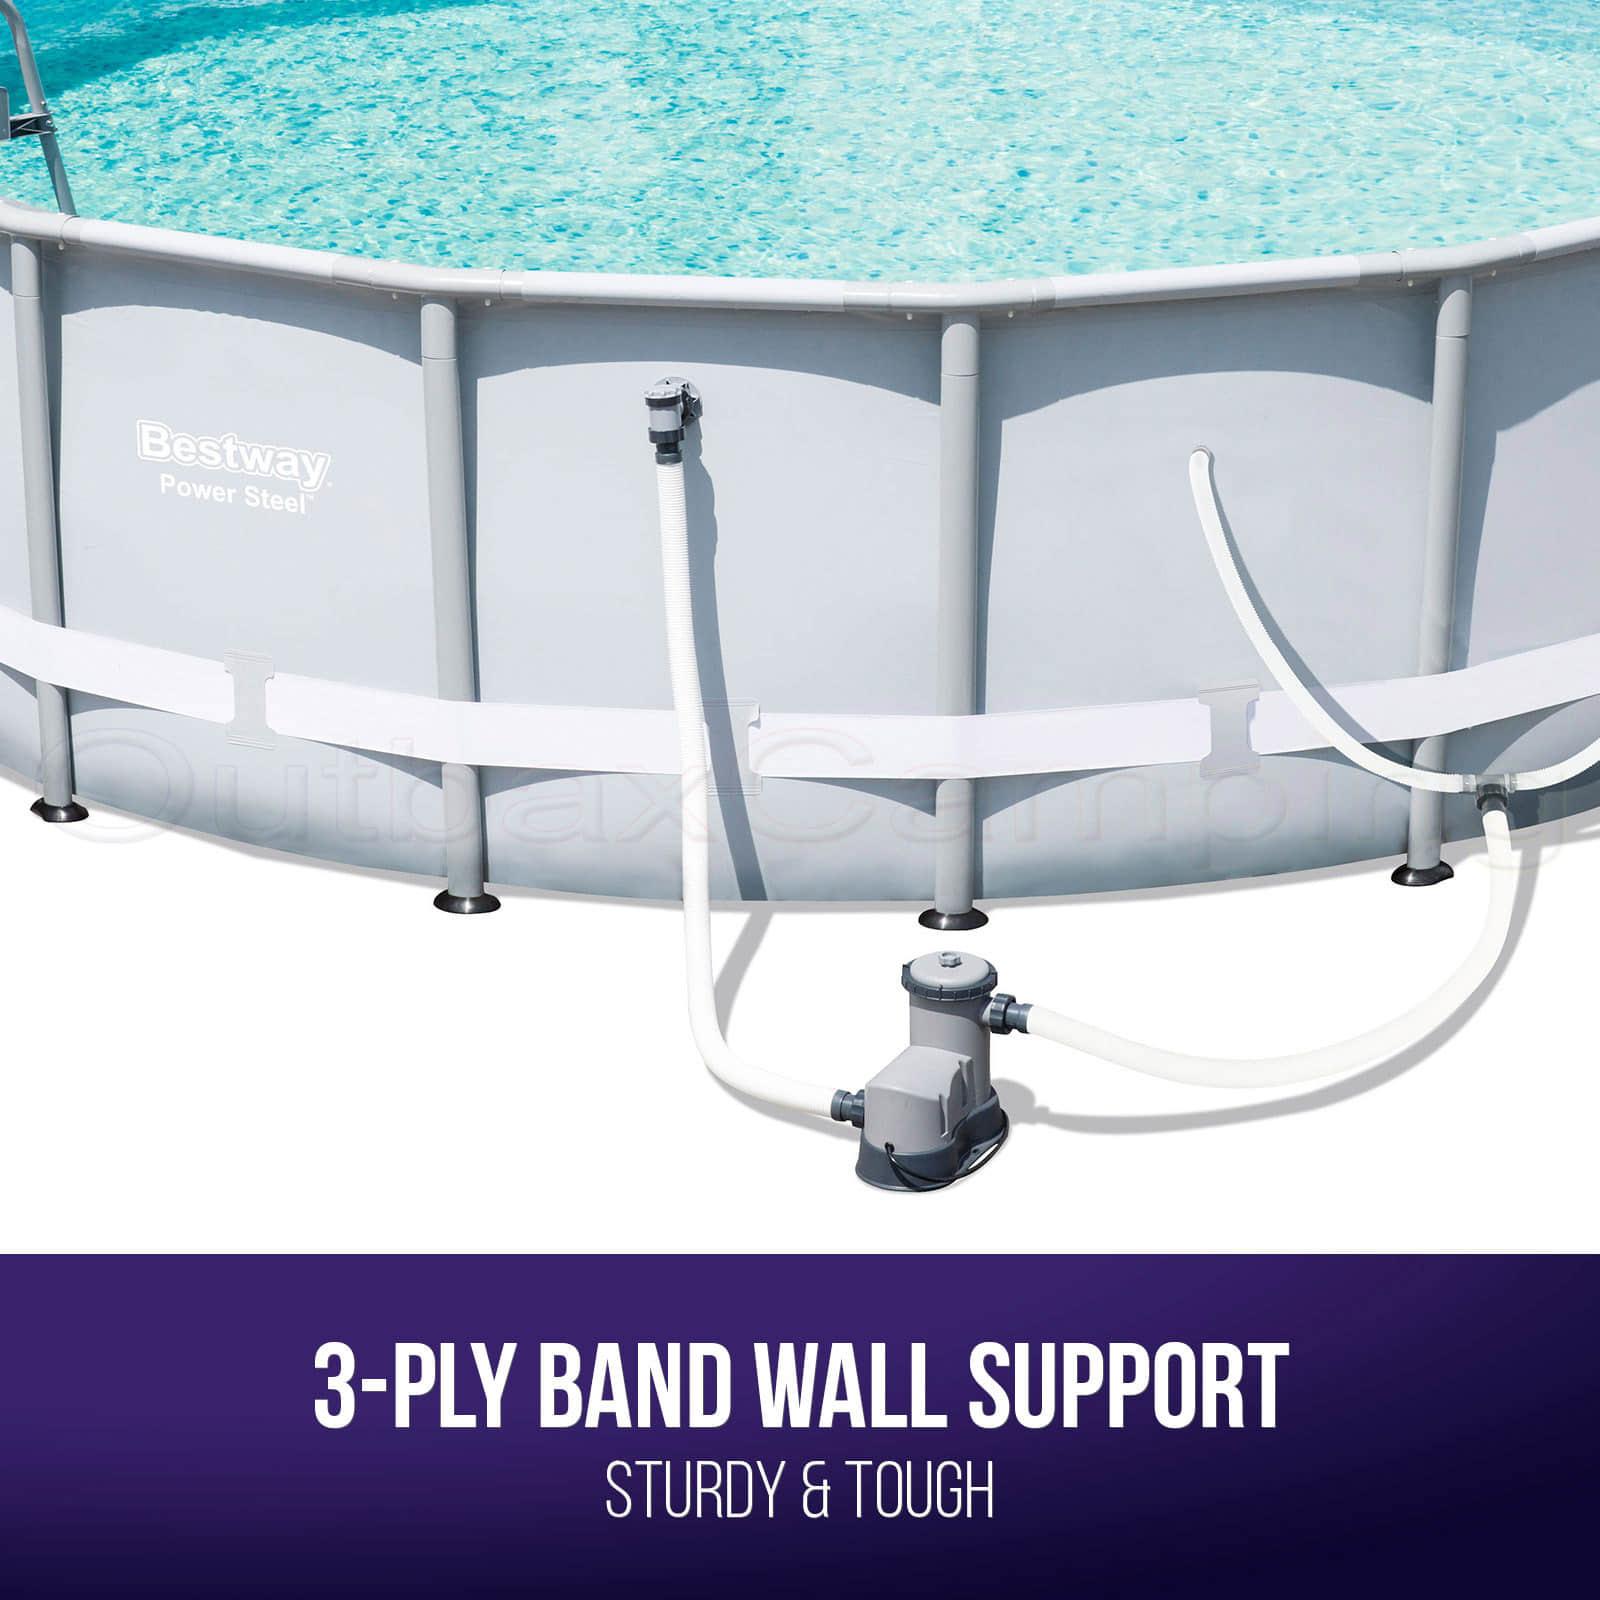 BESTWAY ABOVE GROUND Swimming Pool Metal Frame Filter Pump 16ft 20L ...